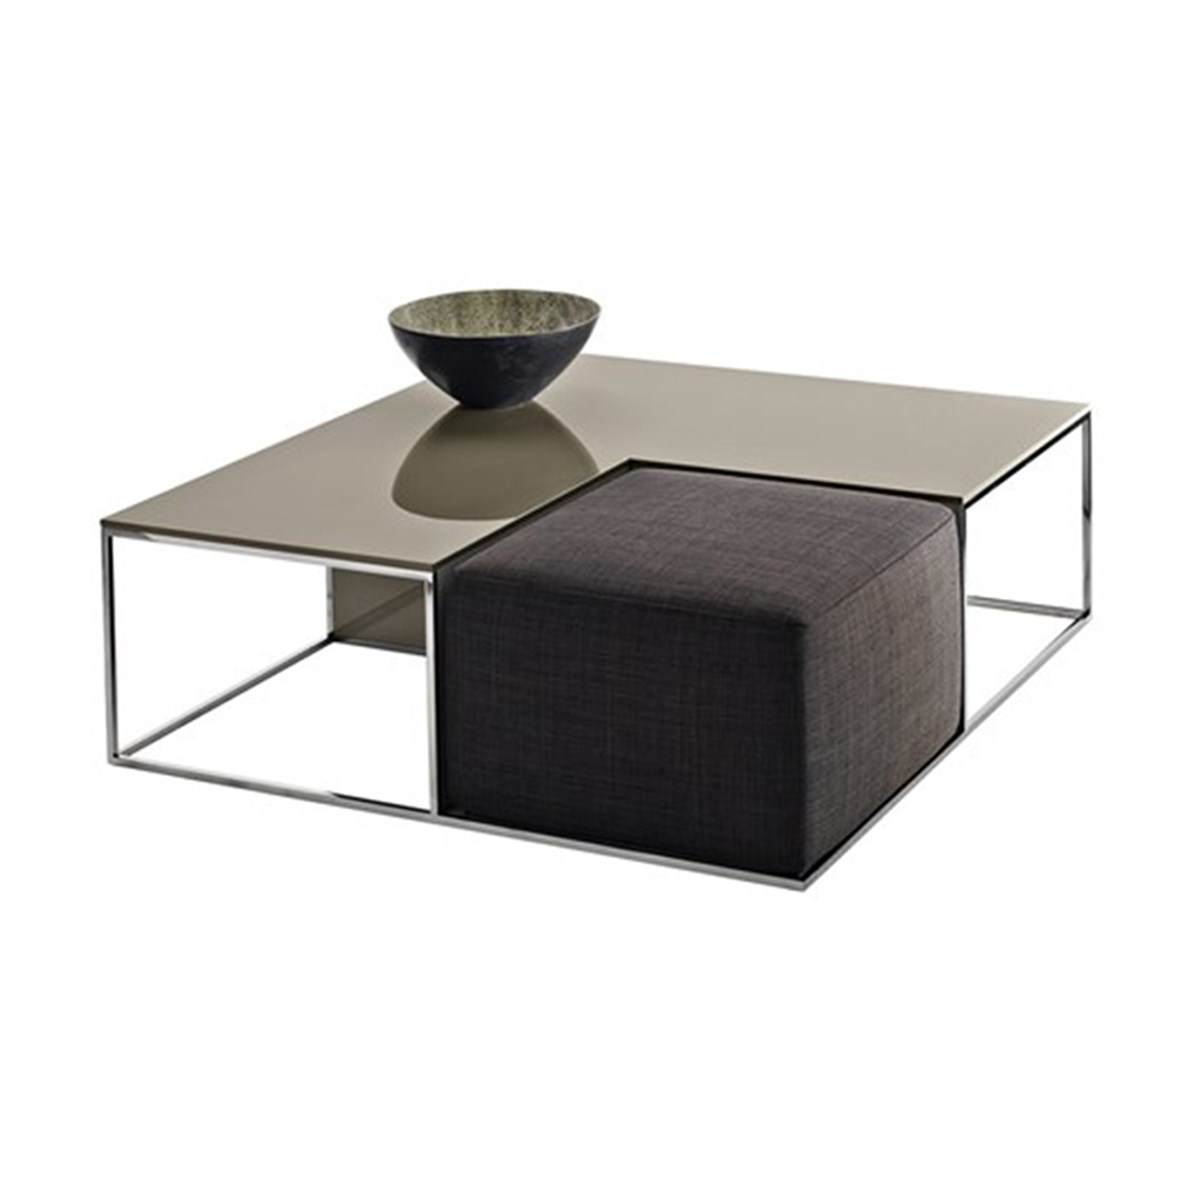 B&B-Italia-Paolo-Piva-Area-Low-Table_Matisse-1